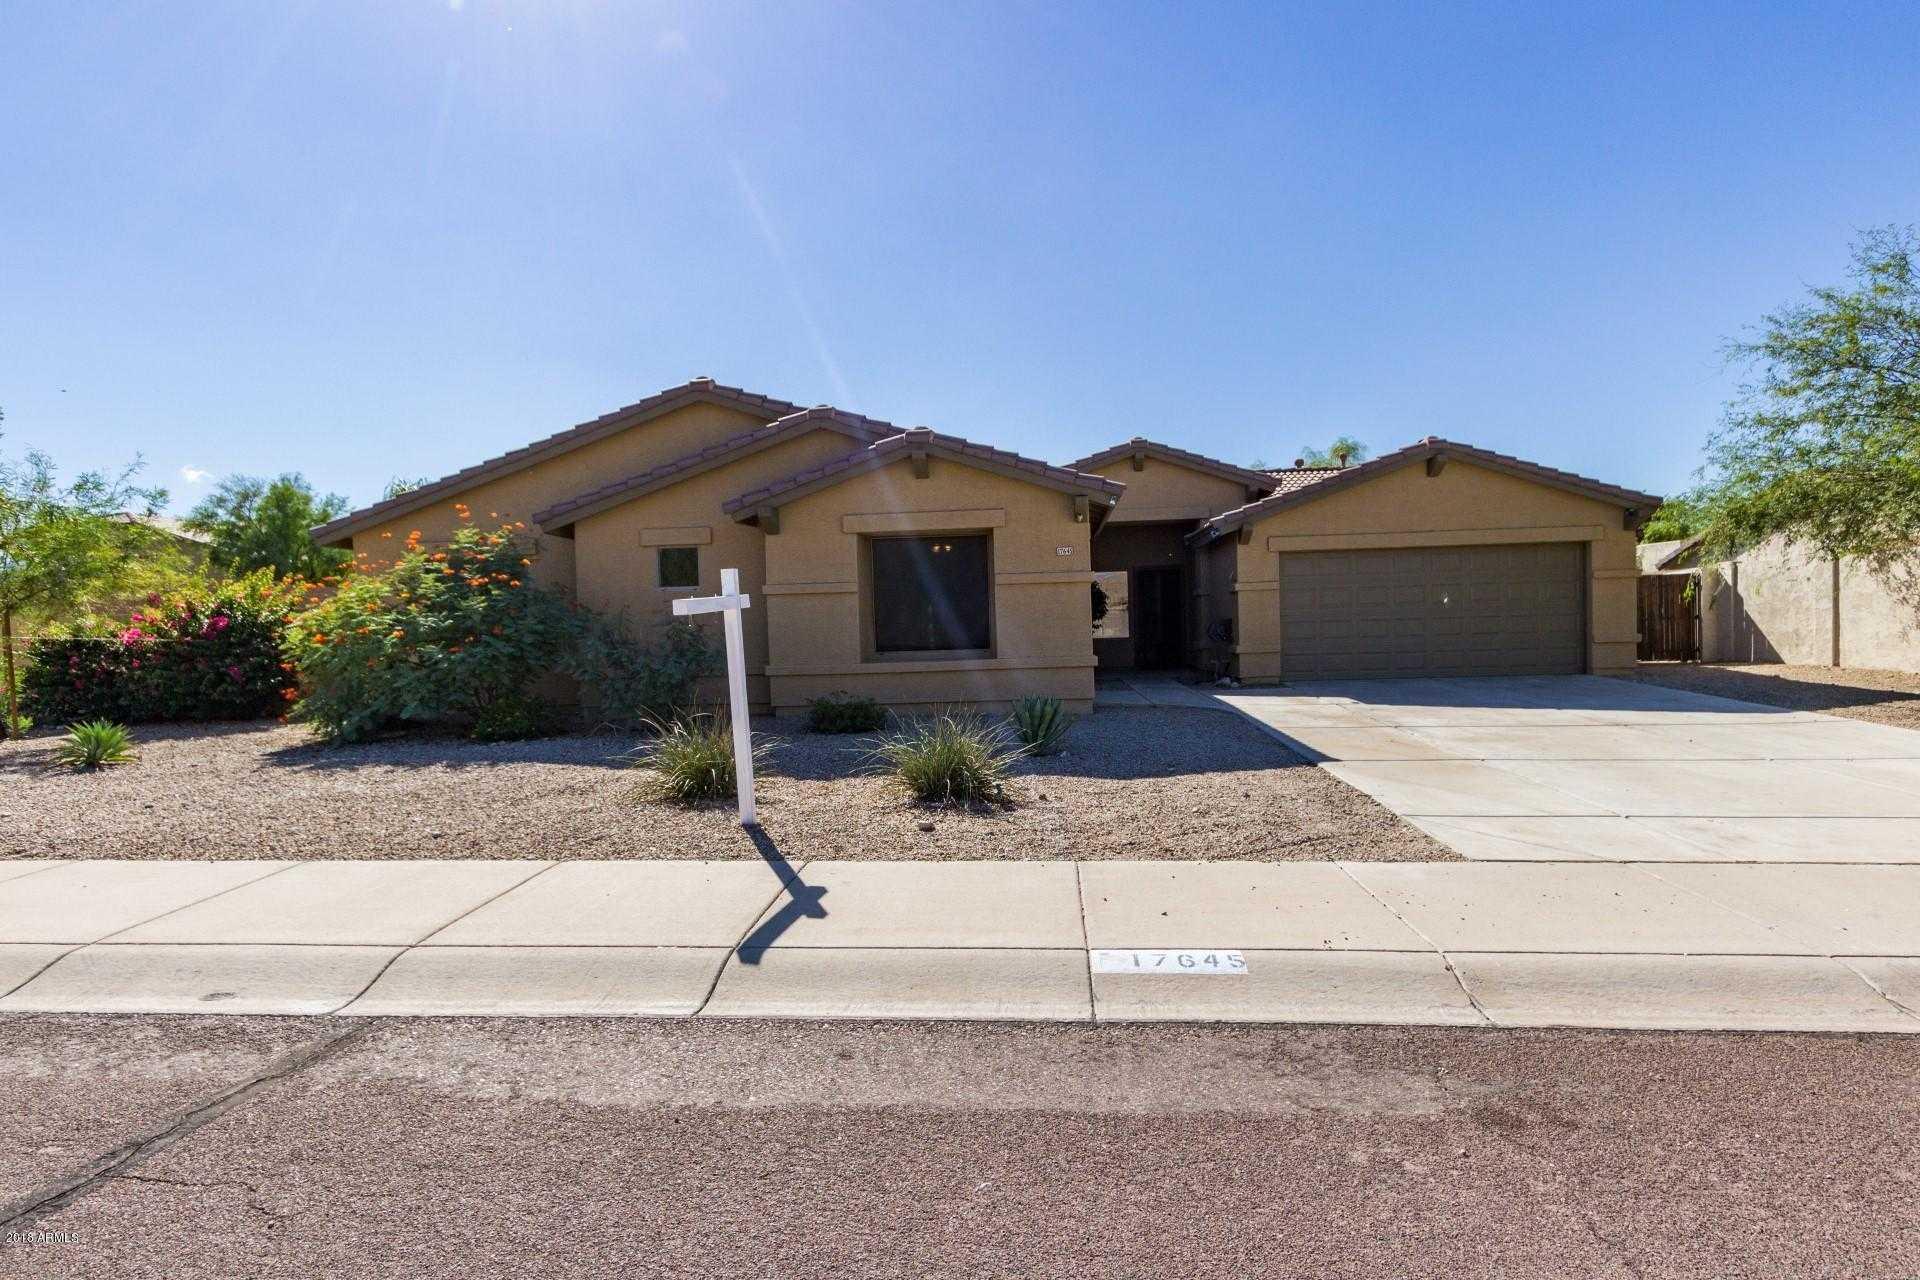 $317,770 - 4Br/2Ba - Home for Sale in Estrella Mt Ranch, Goodyear